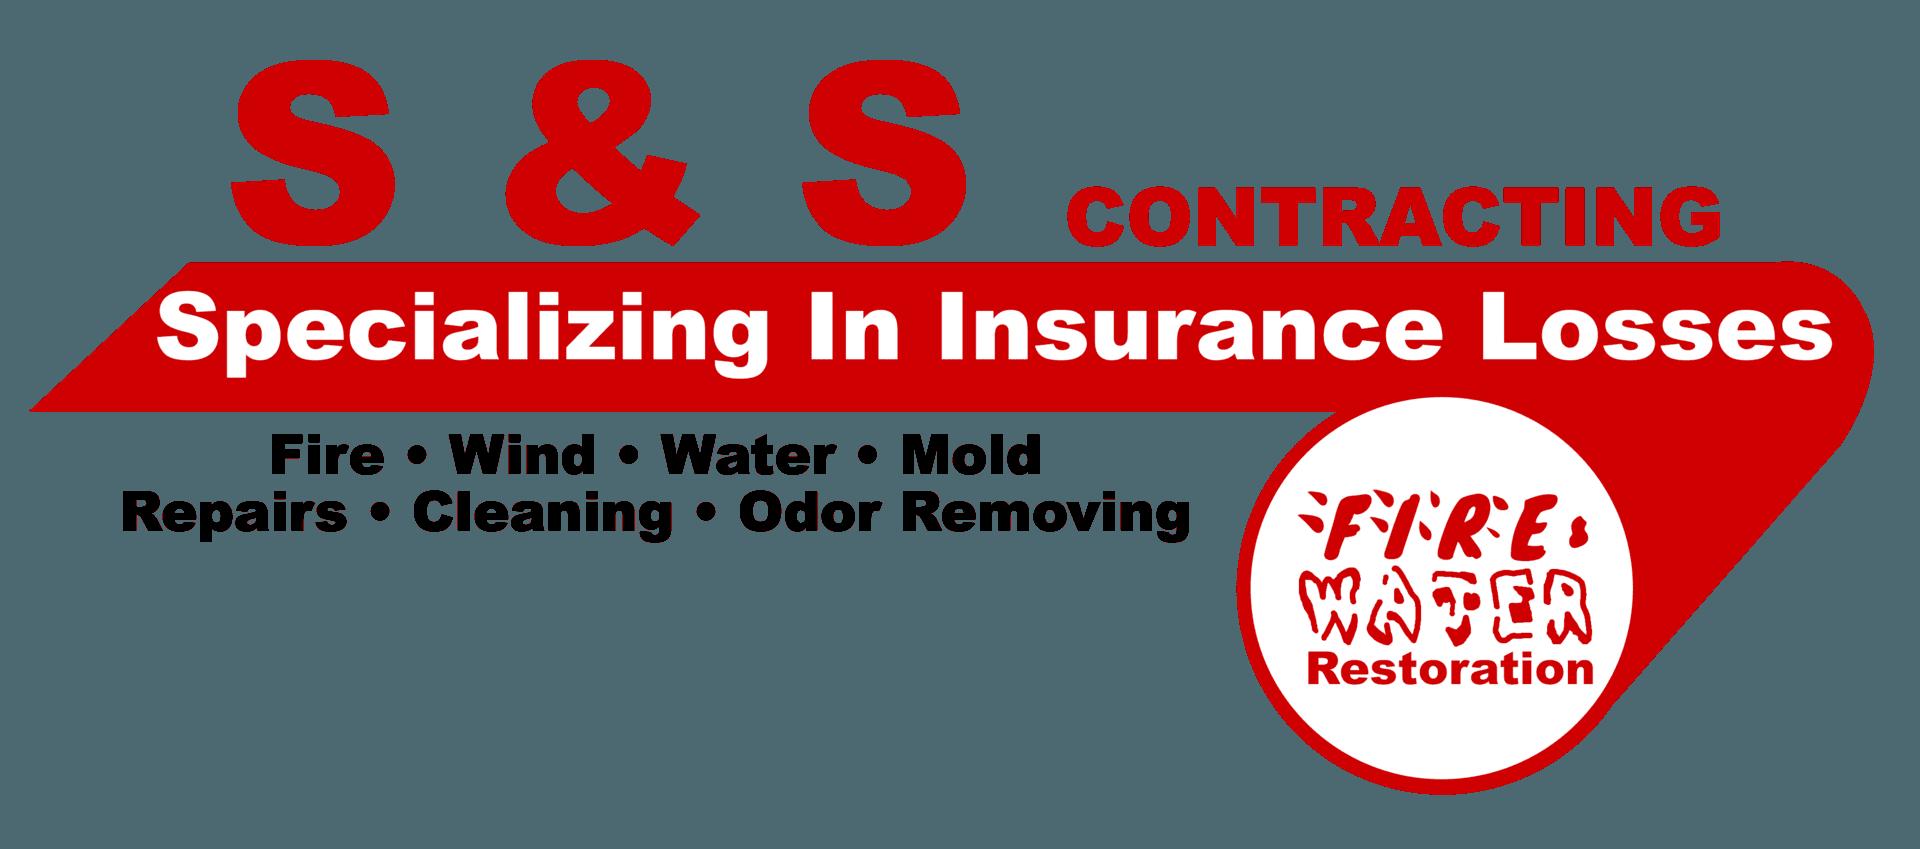 S & S Contracting Logo